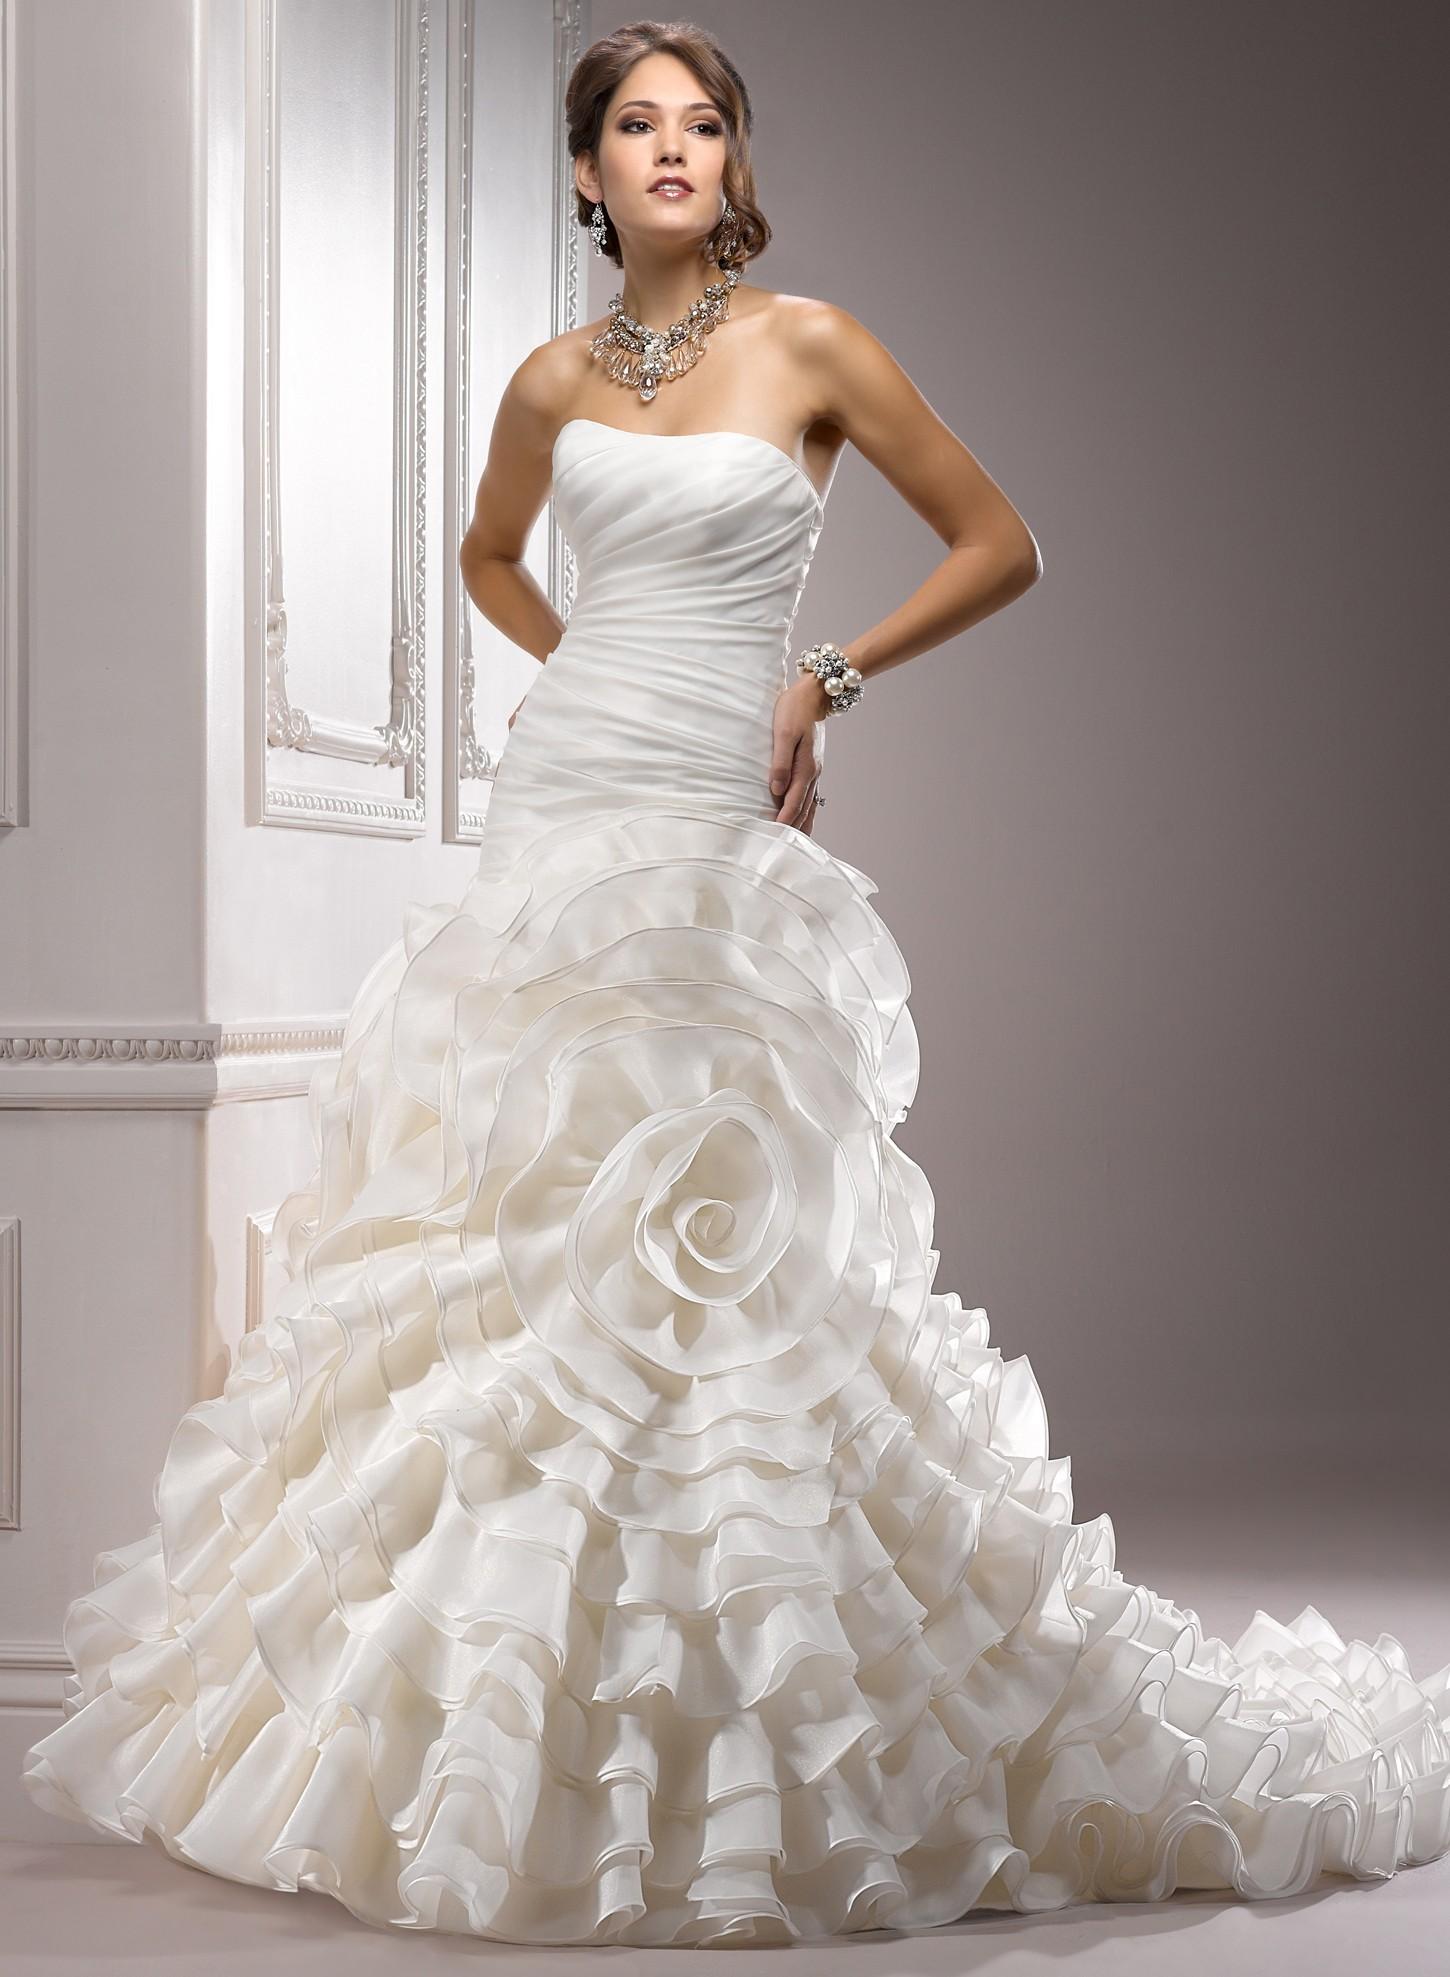 top wedding dresses best wedding dresses Top Wedding Dresses 82